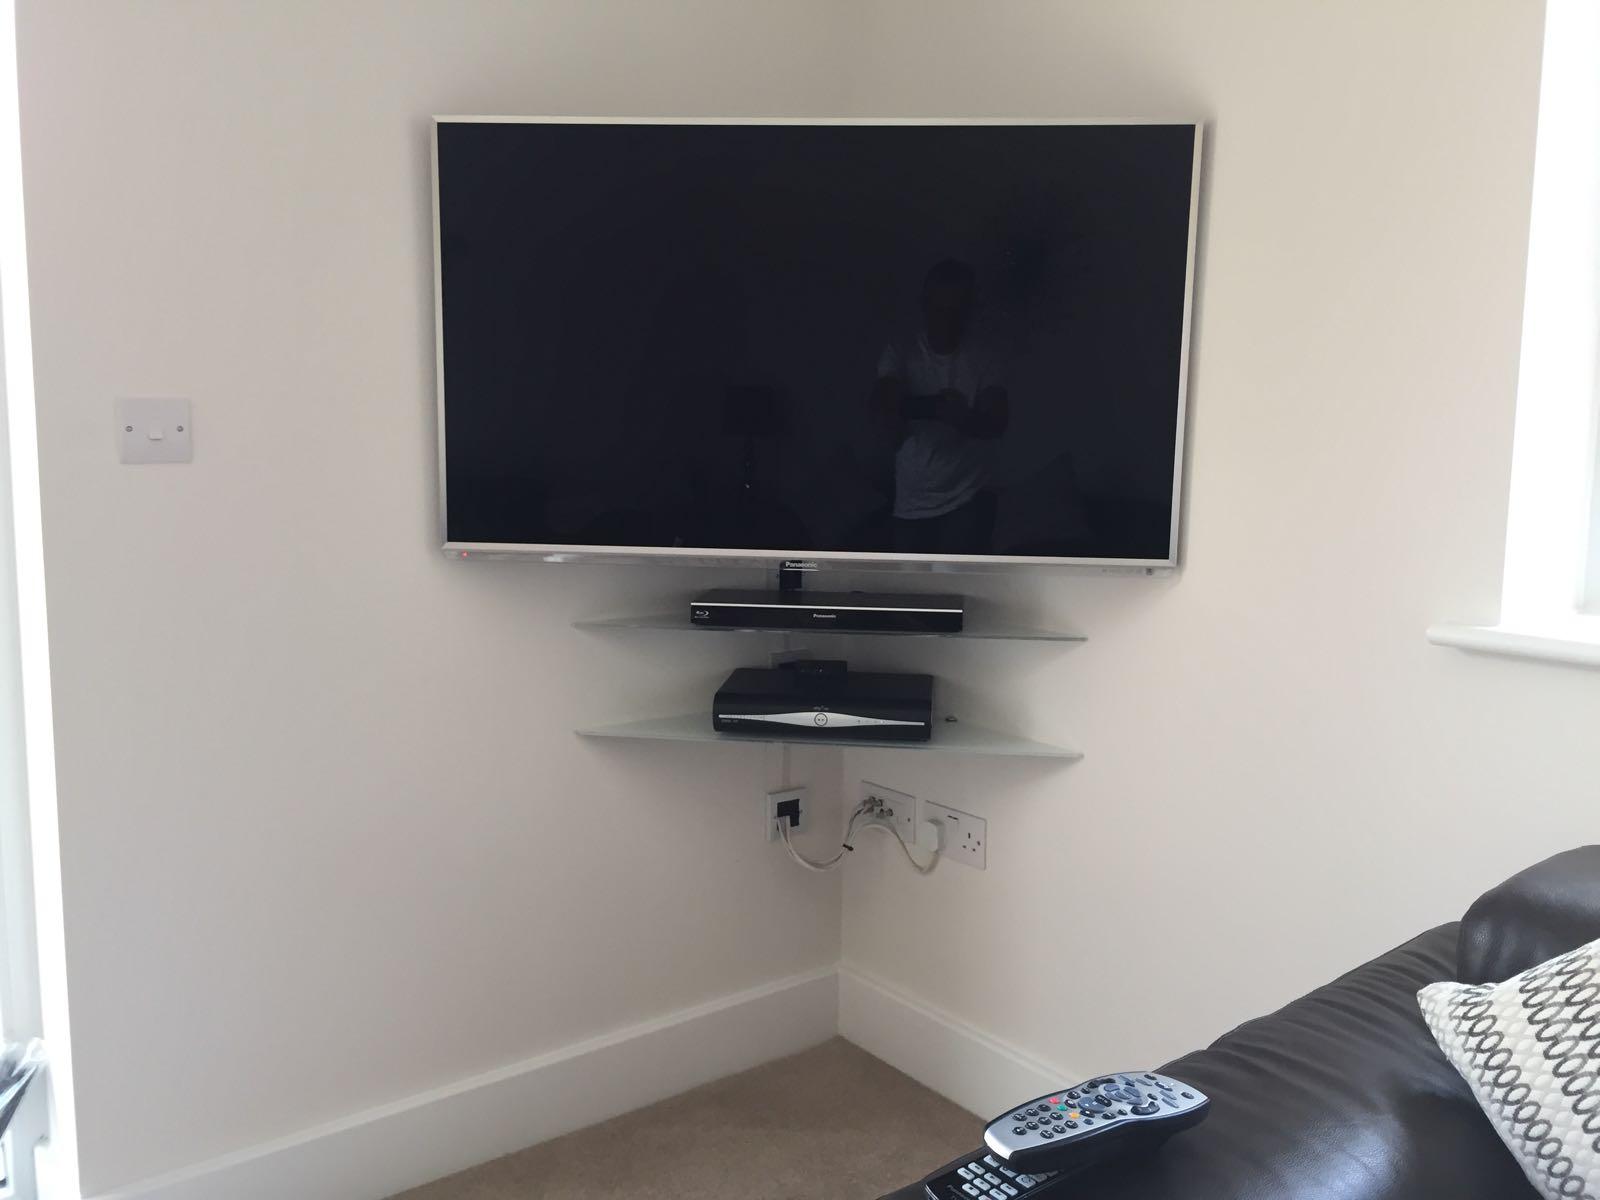 Panasonic TV and SKY Satellite Install in Brightlingsea Essex